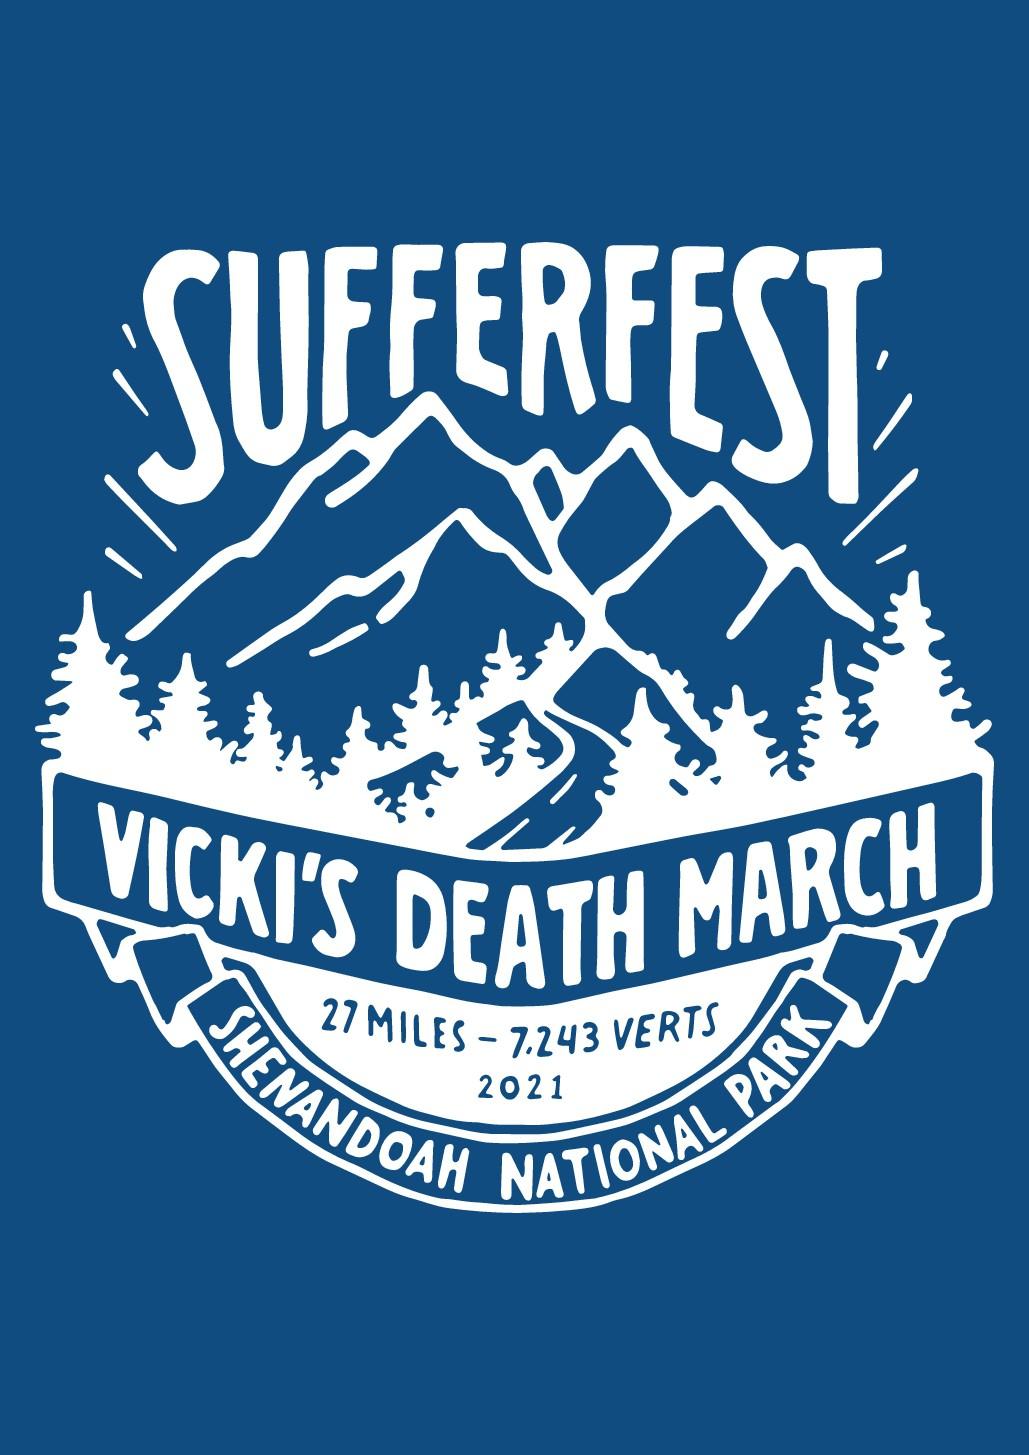 SUFFERFEST - VICKI'S DEATH MARCH